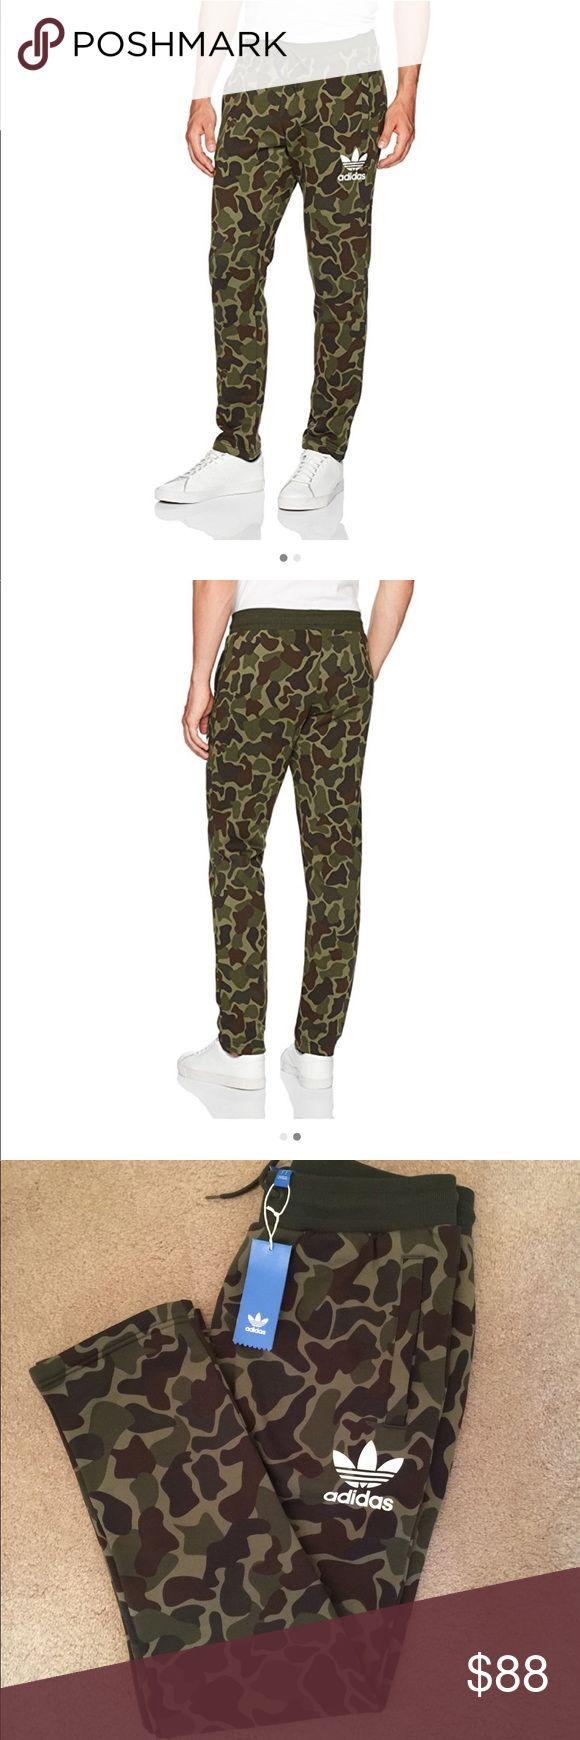 adidas pants on sale adidas xr1 duck camo